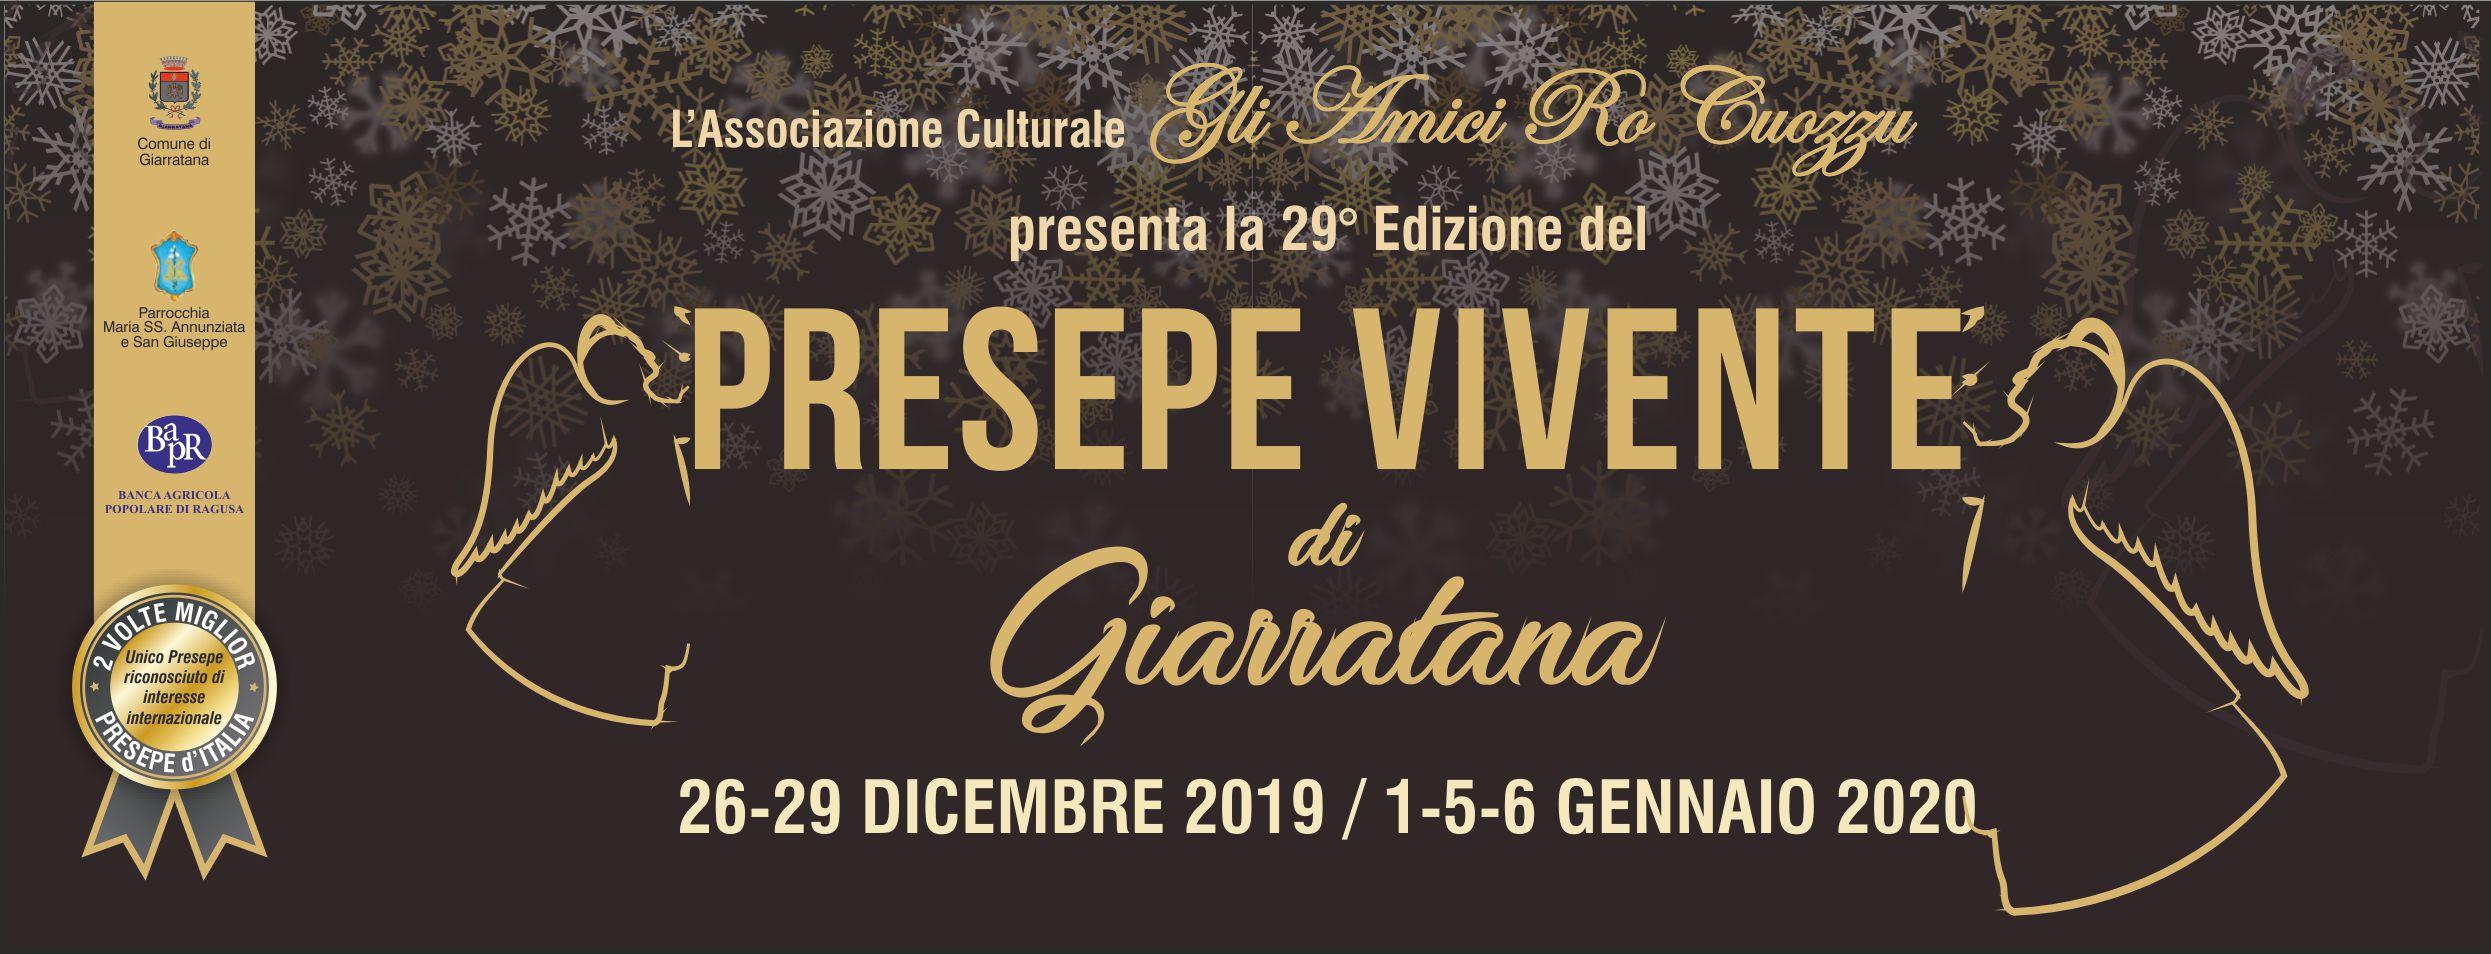 Presepe_Vivente_Giarratana